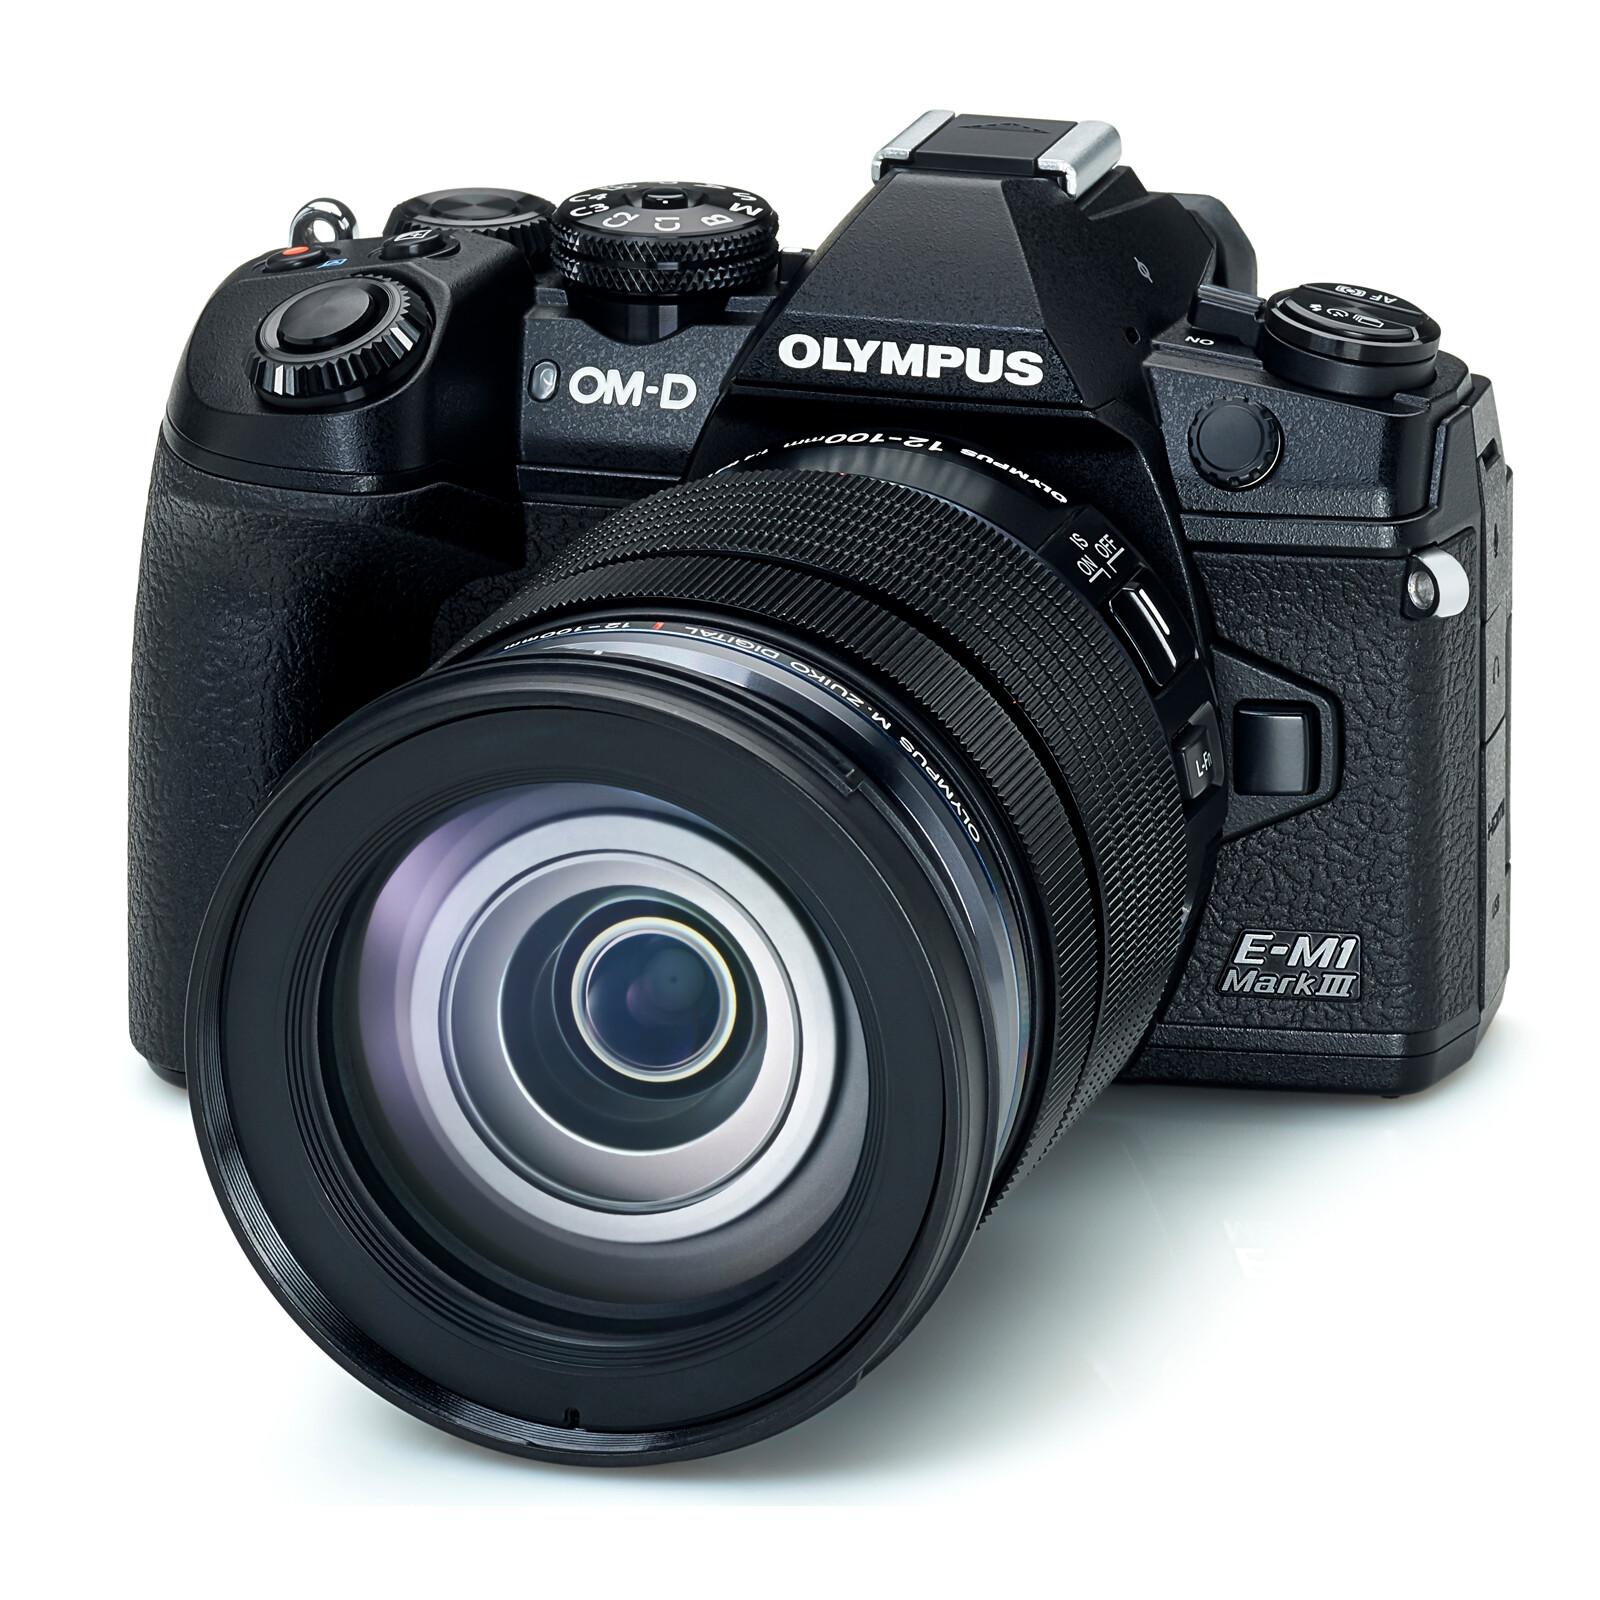 Olympus OM-D E-M1 Mark III +ED 12-100/4,0 IS